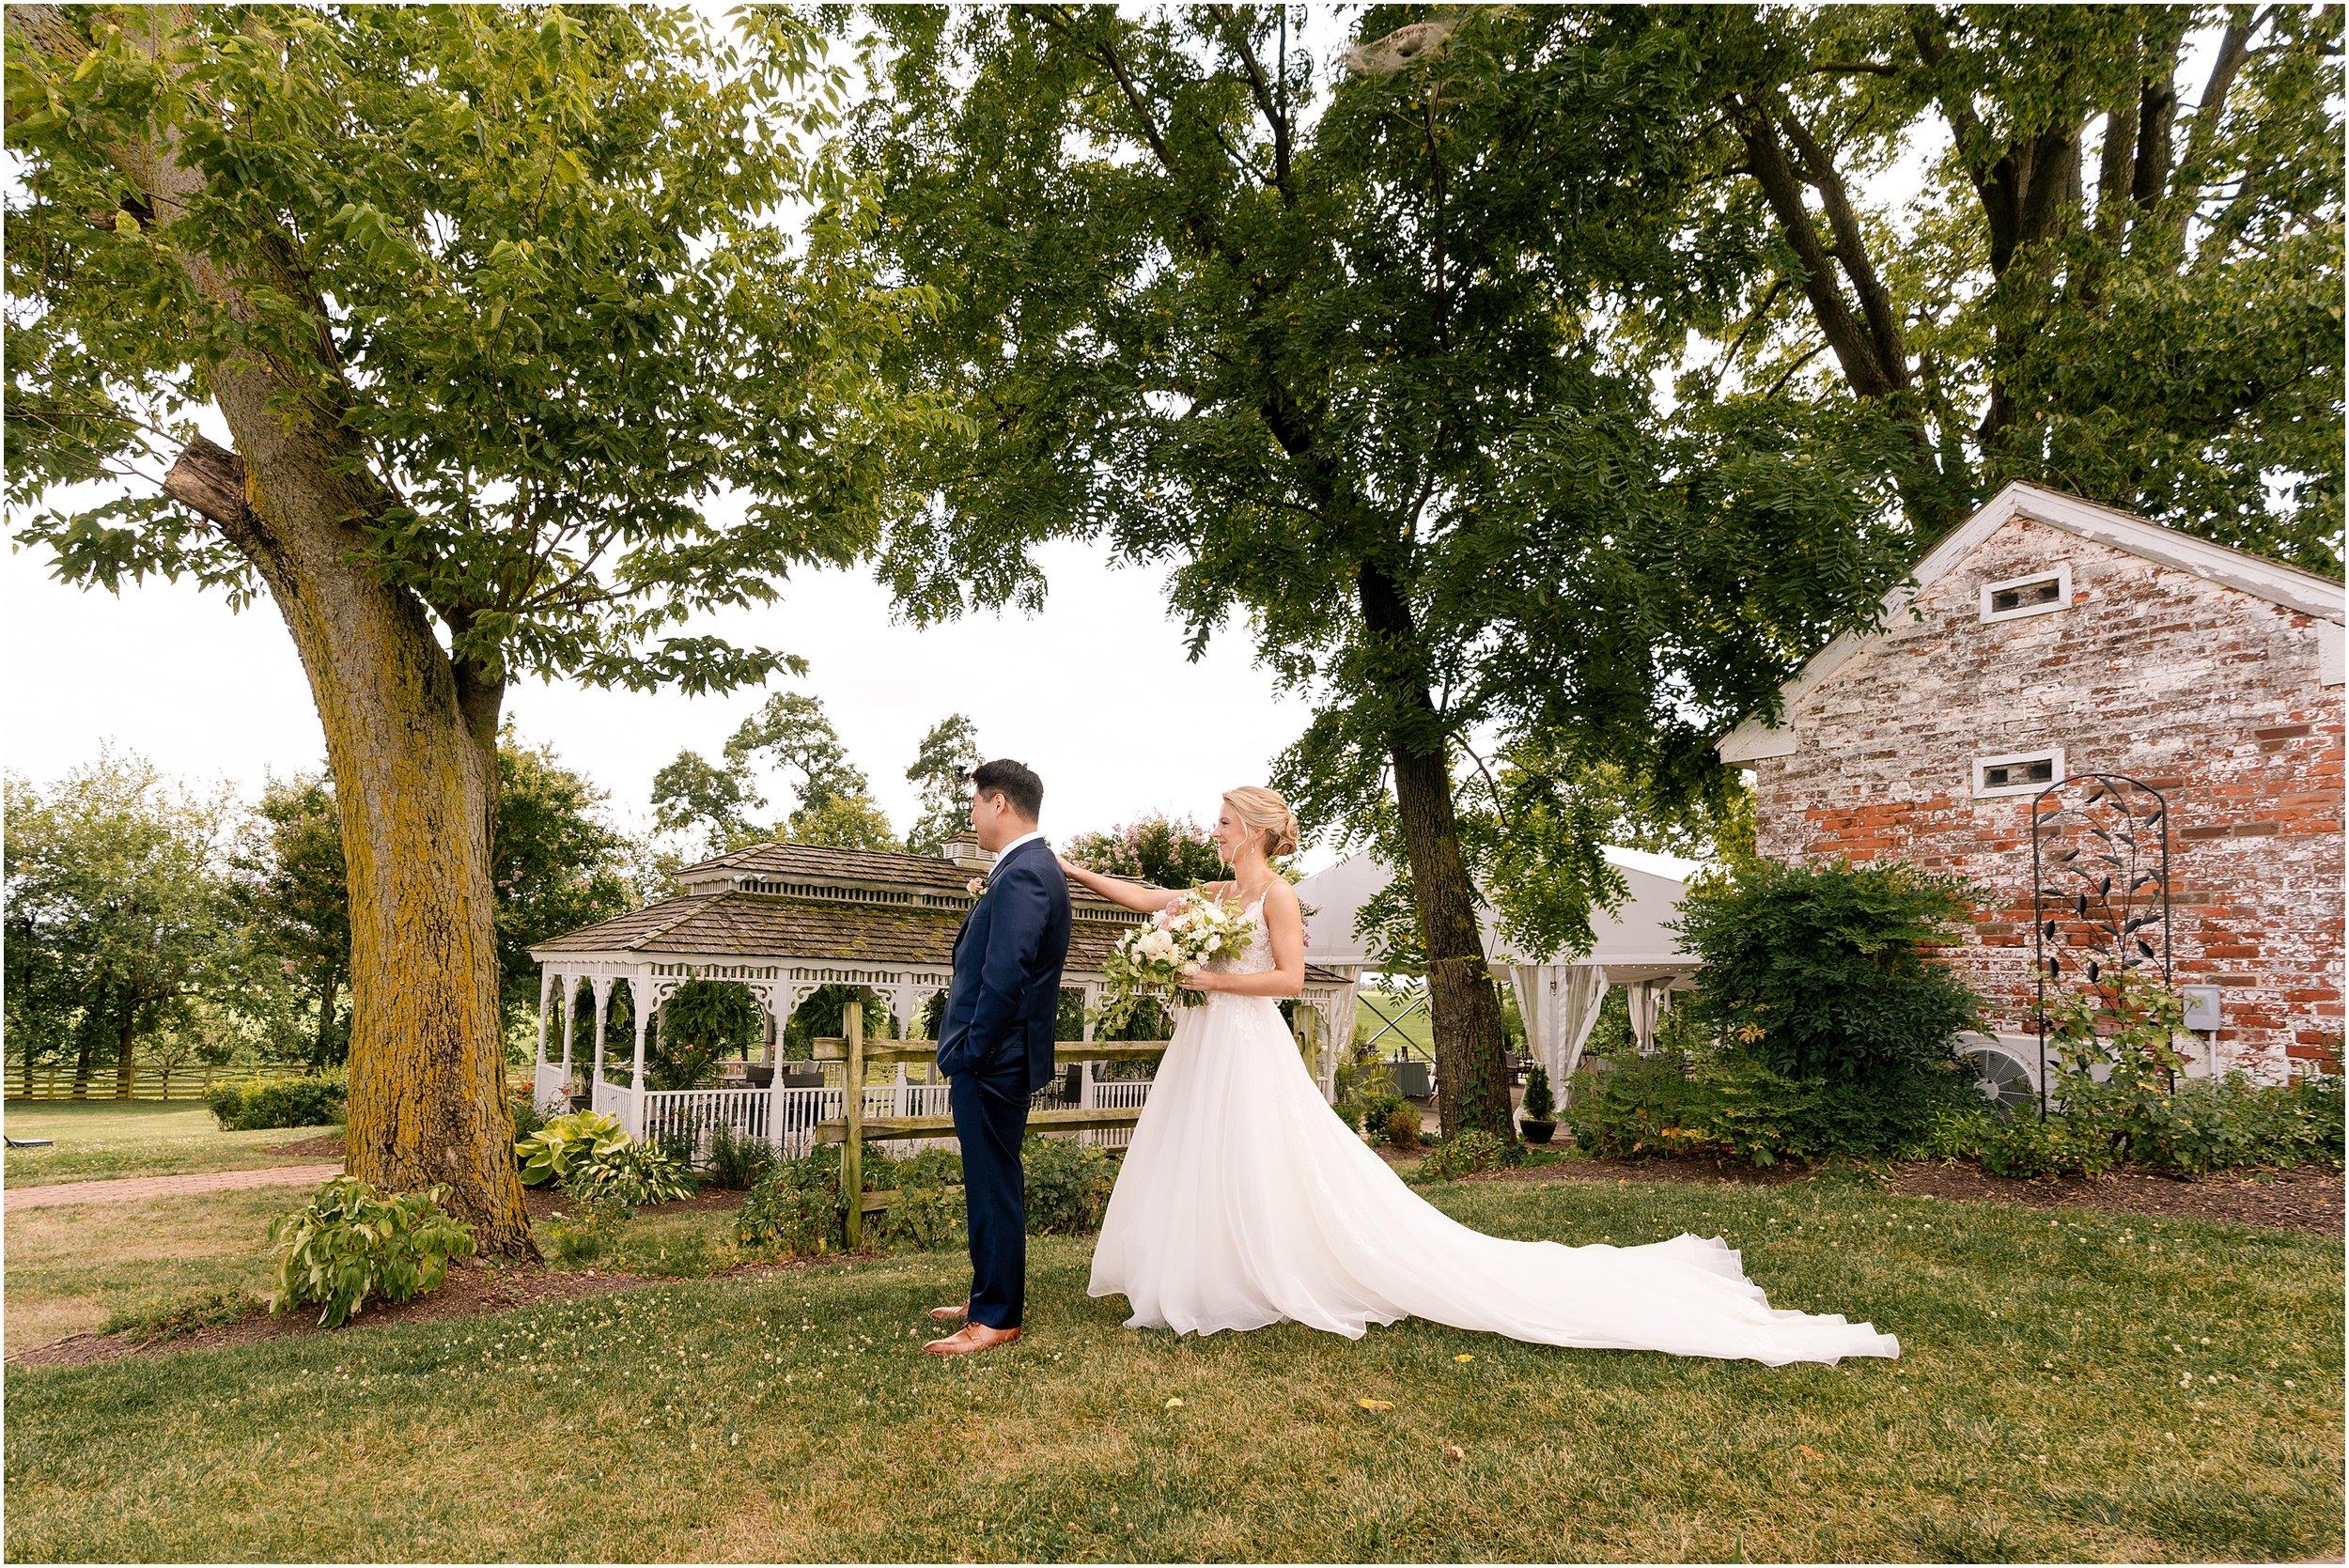 hannah leigh photography Walkers Overlook Wedding Walkersville MD_3584.jpg